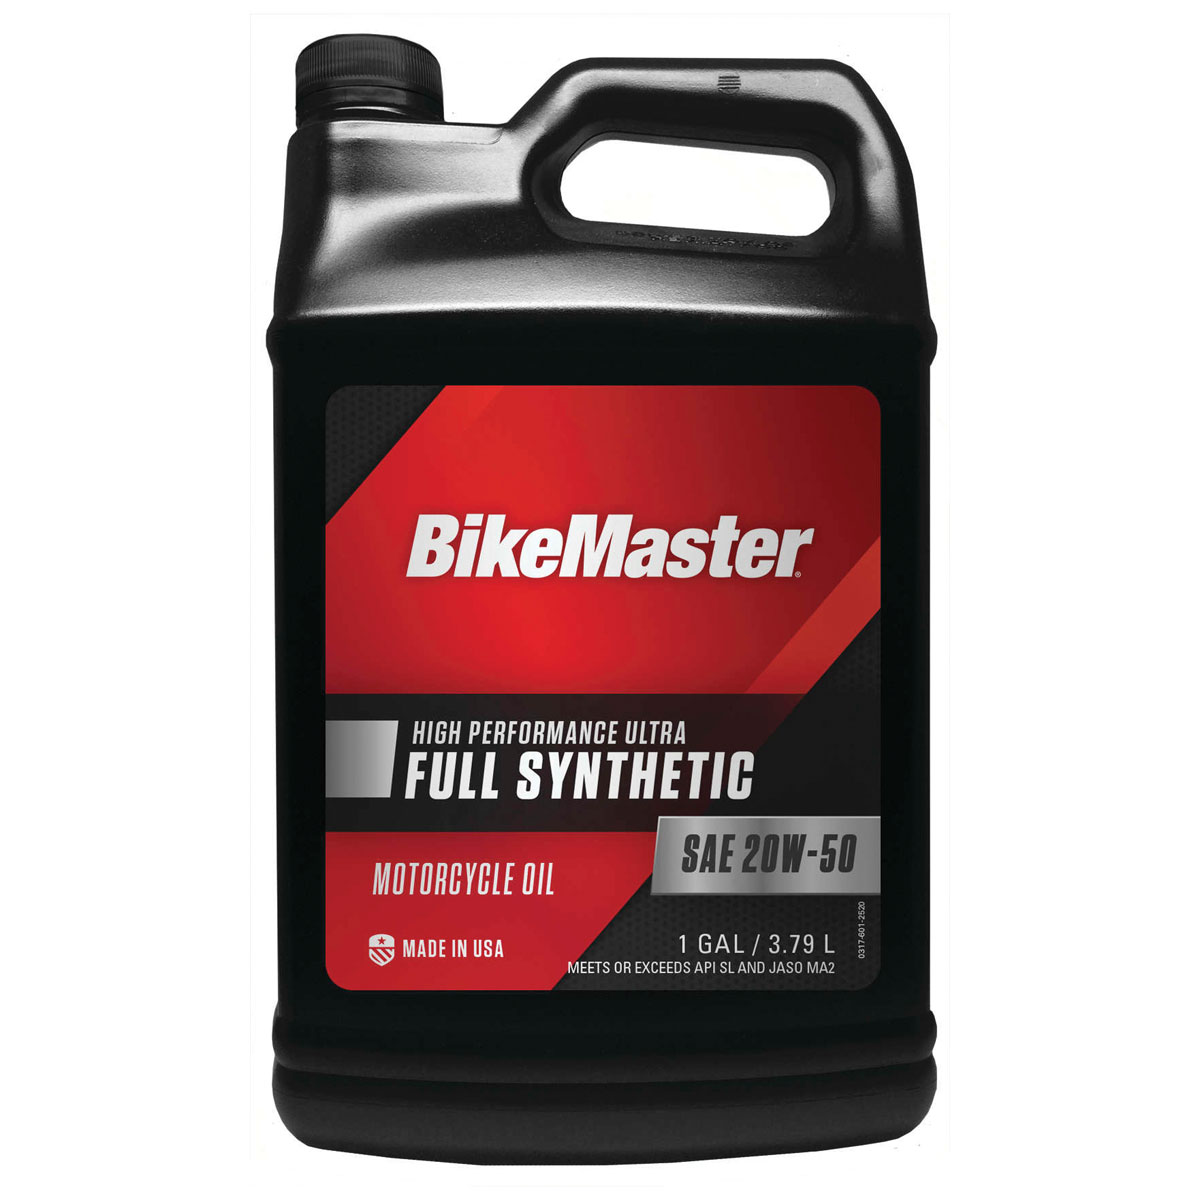 BikeMaster Full-Synthetic 20W50 Engine Oil Gallon